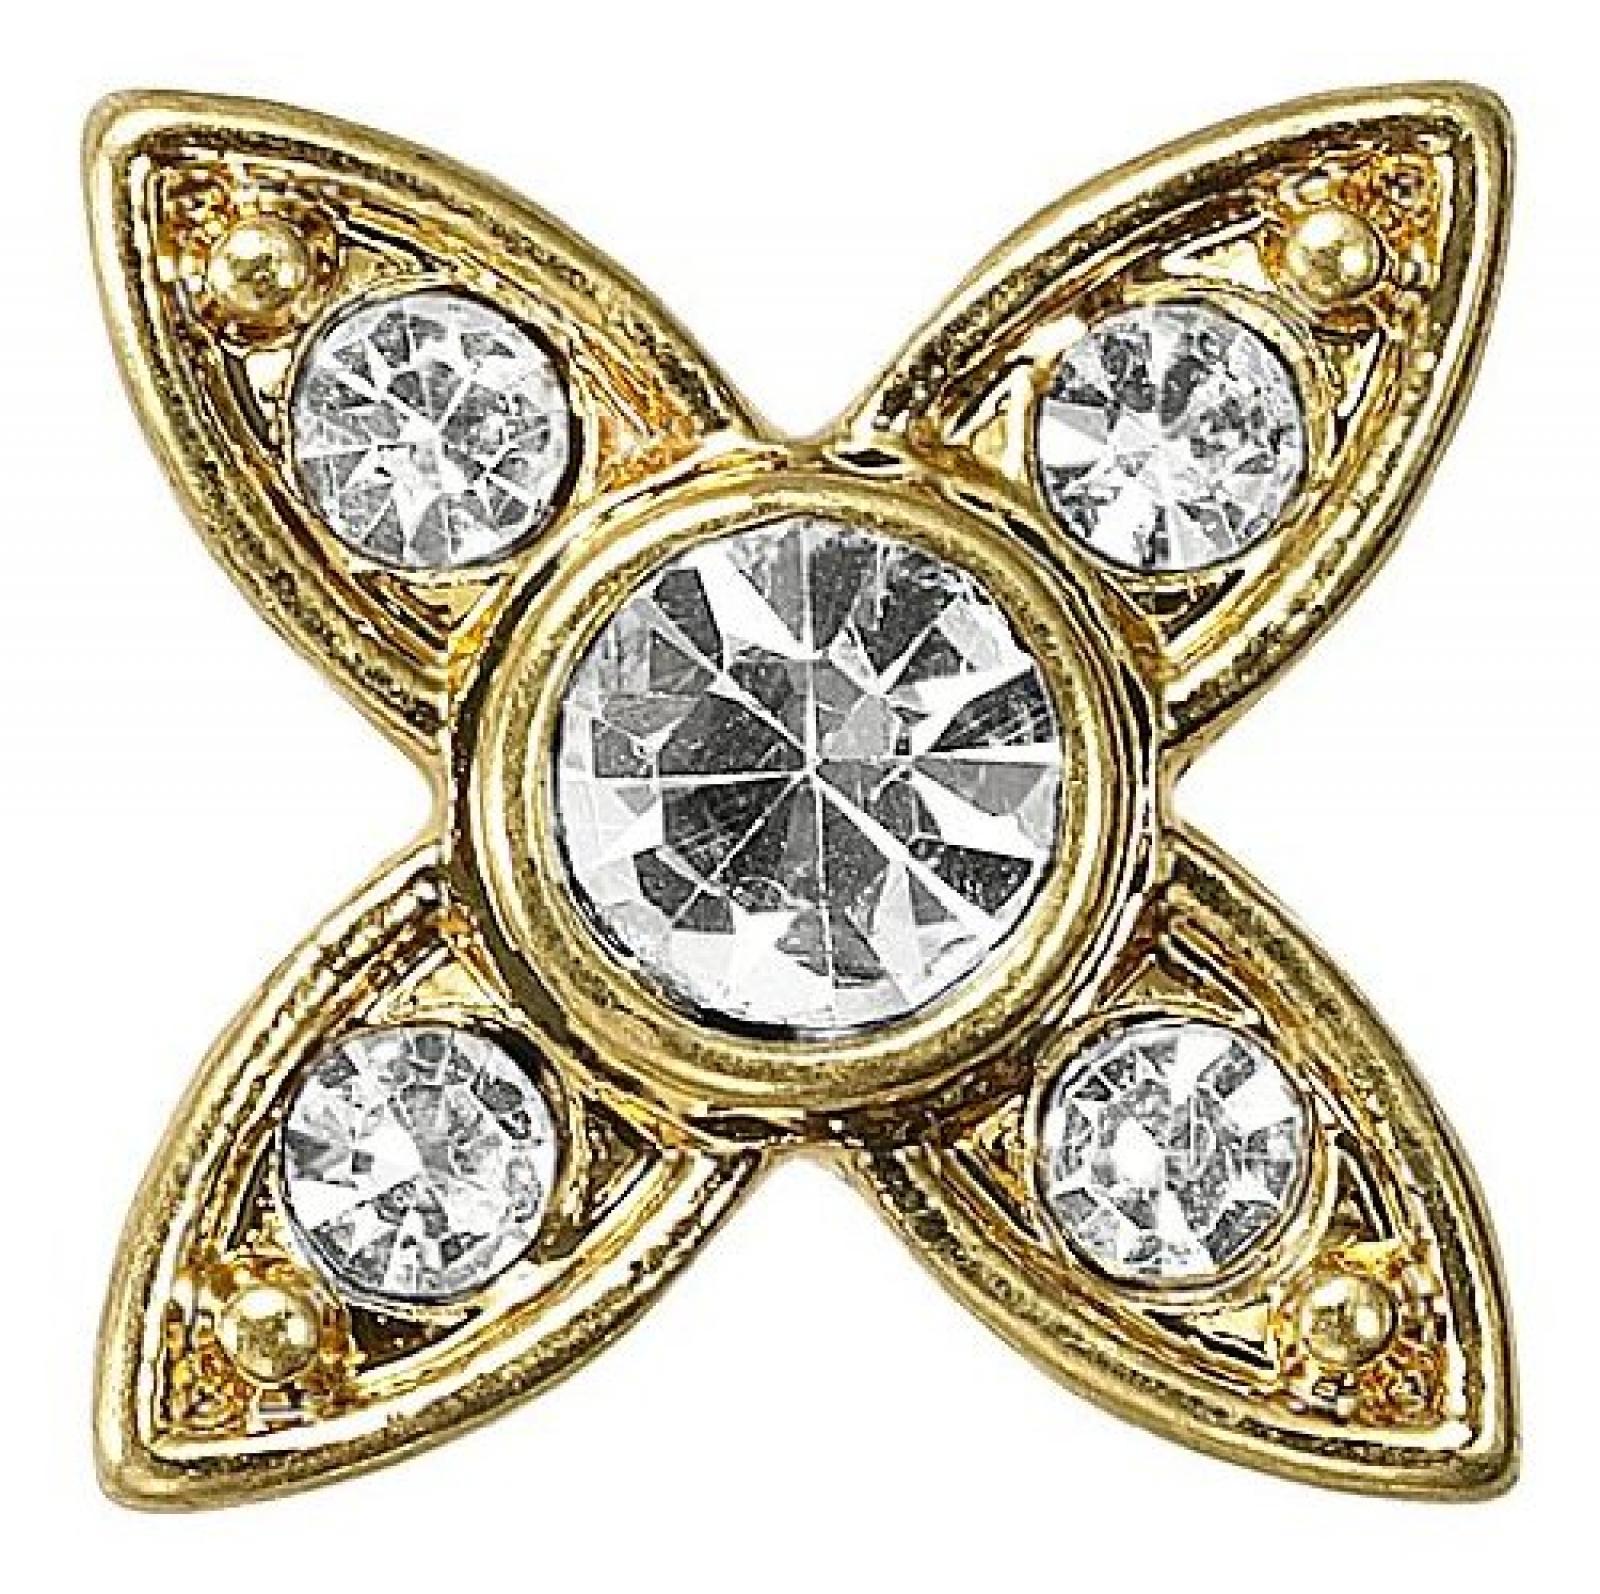 Pilgrim Damen-Anhänger Charming vergoldet kristall 42121-2035